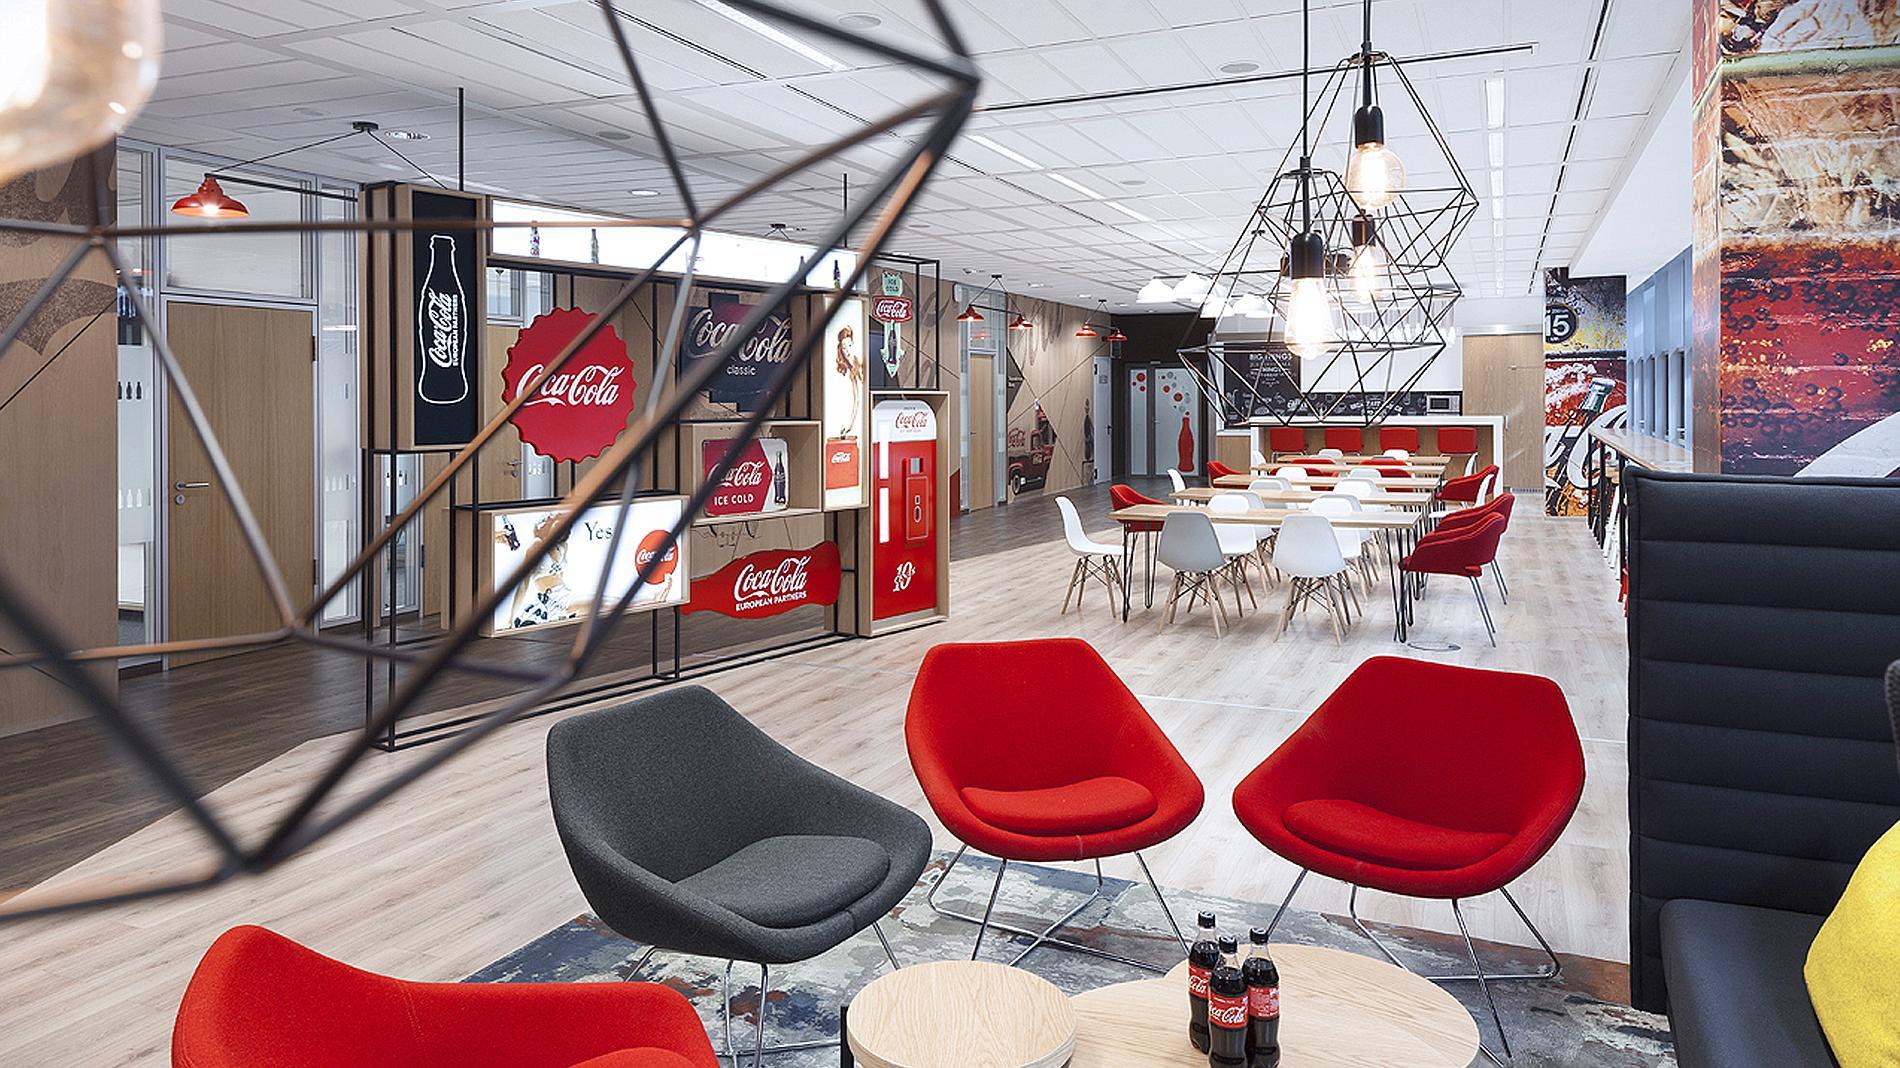 Coca-Cola interior design and branding